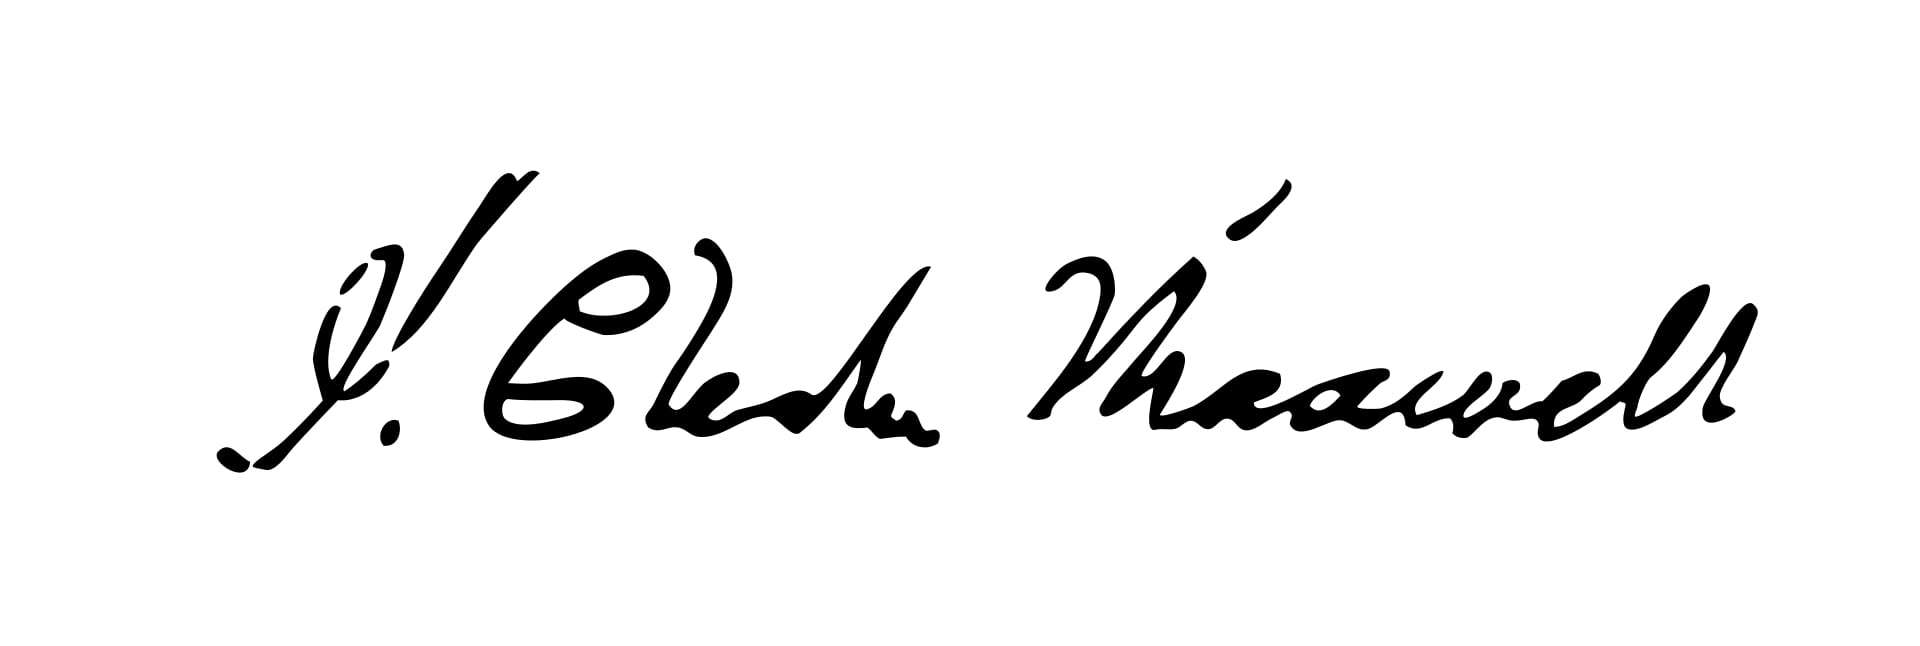 James Clerk Maxwell Signature